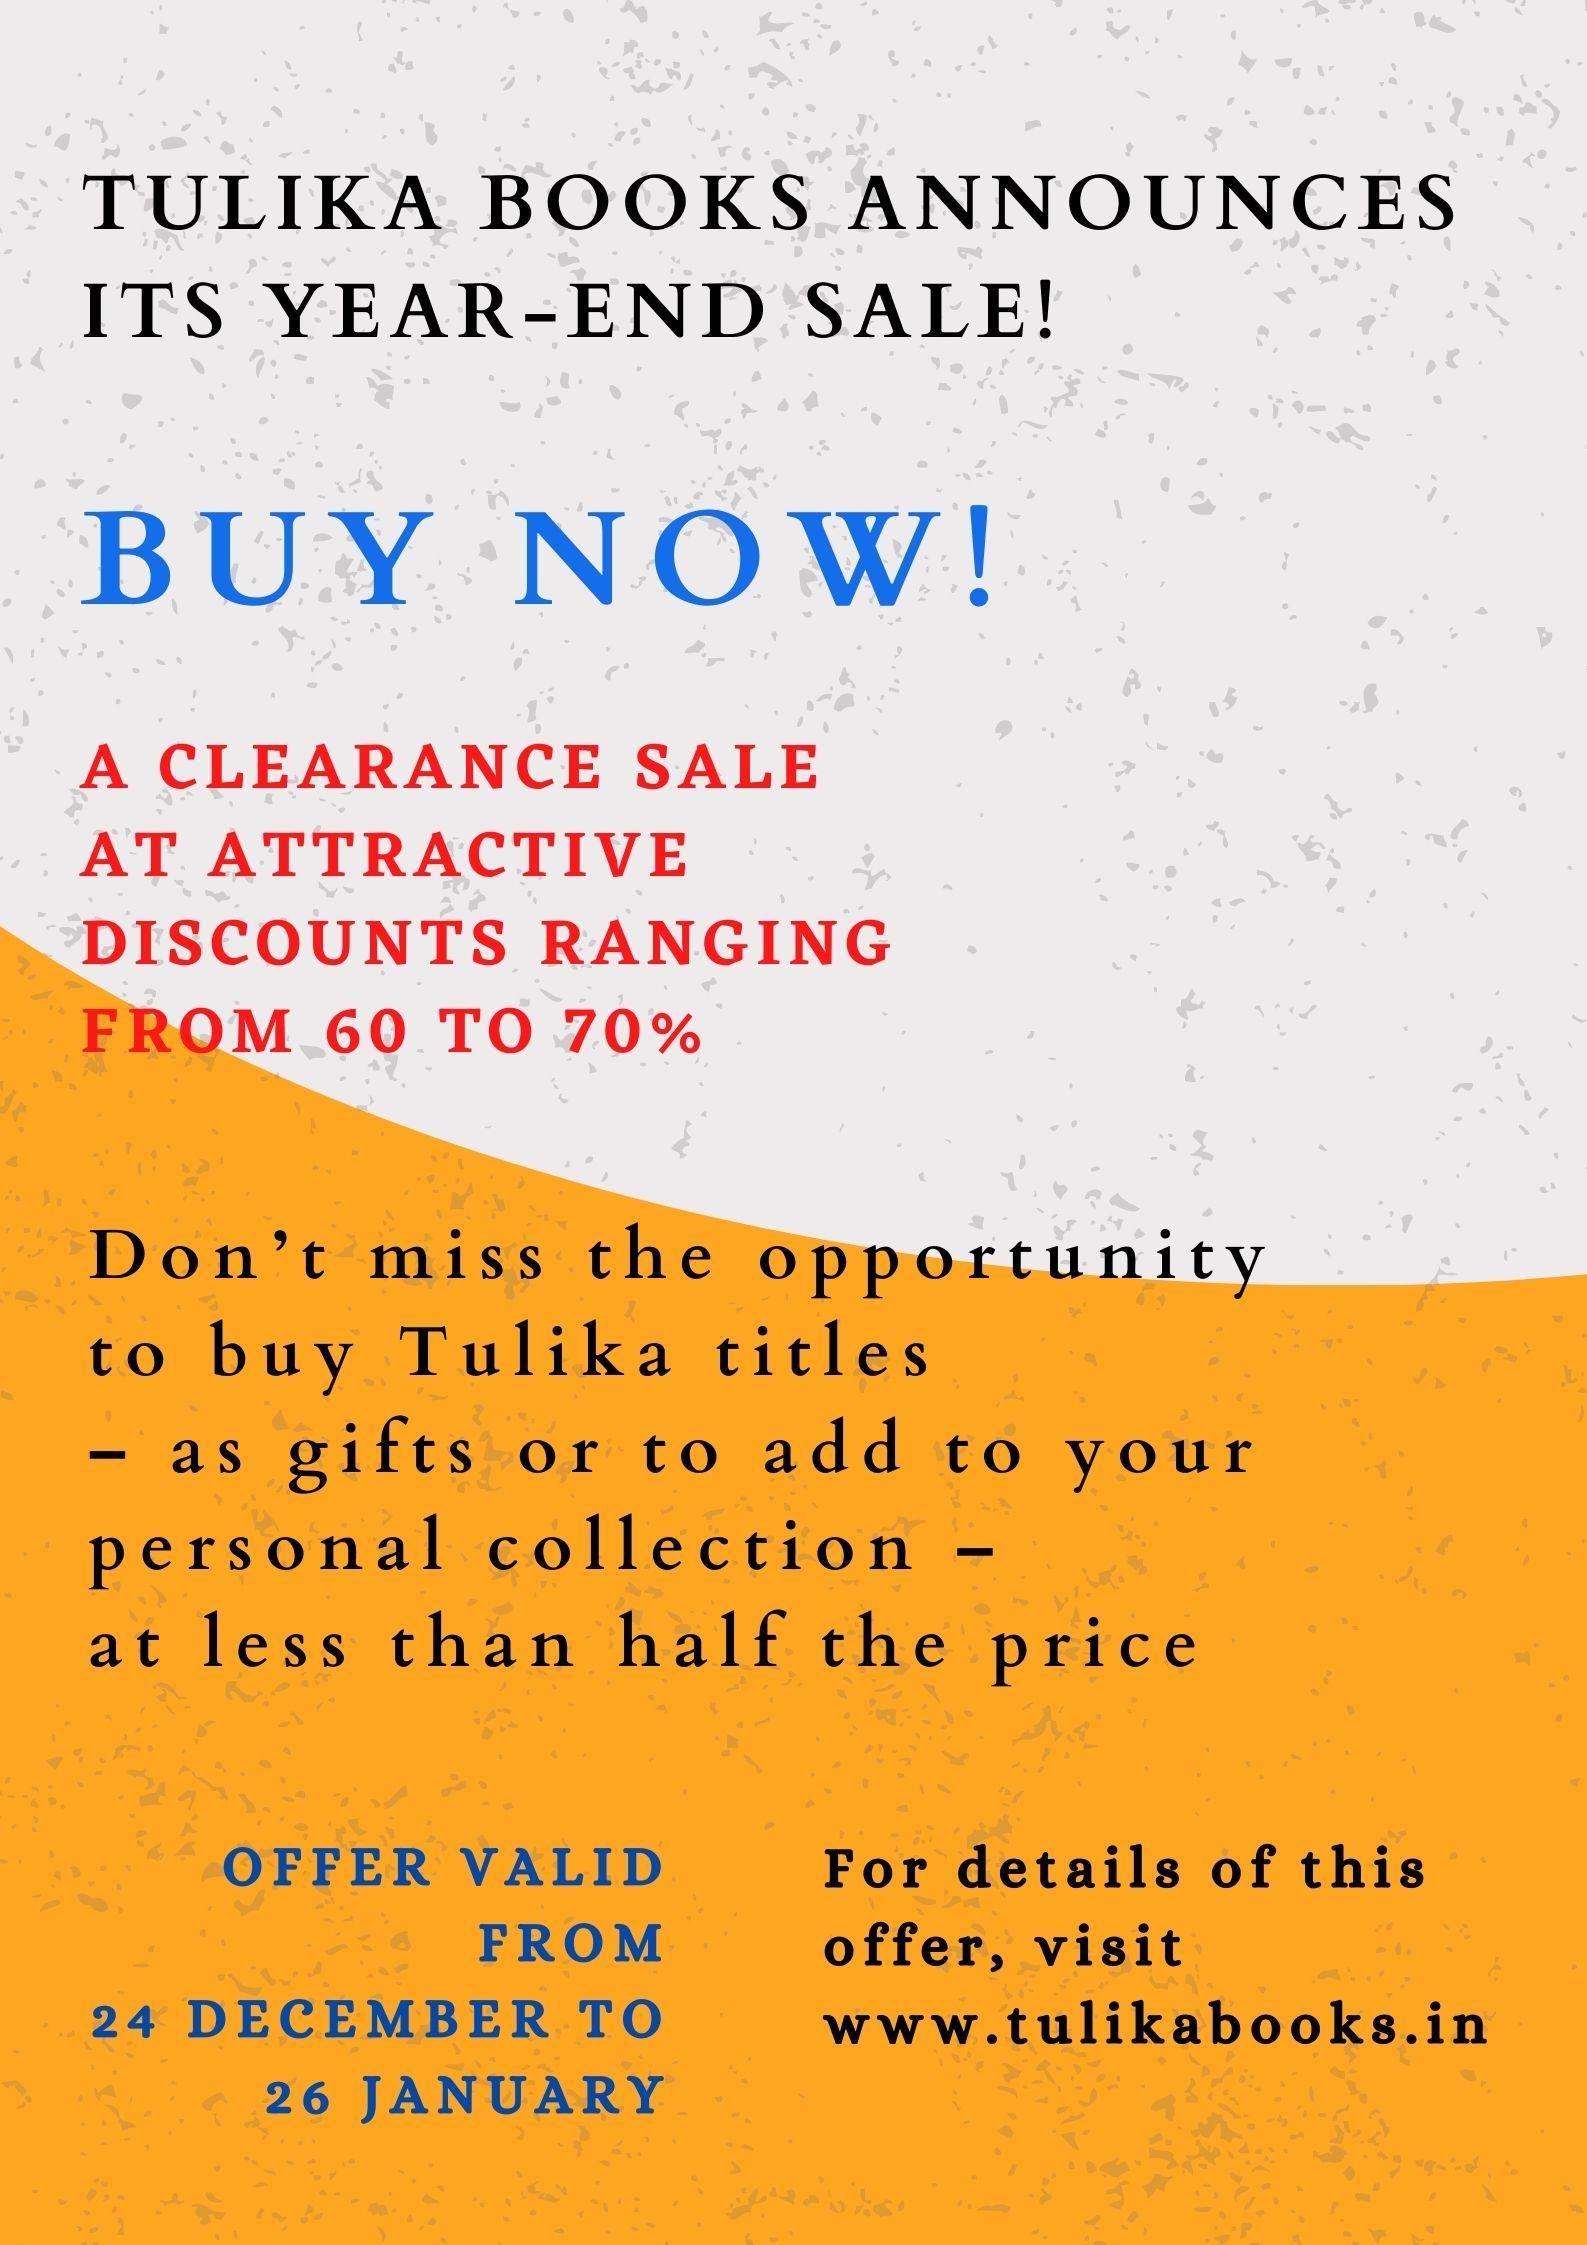 Tulika Books announces its year-end sale!